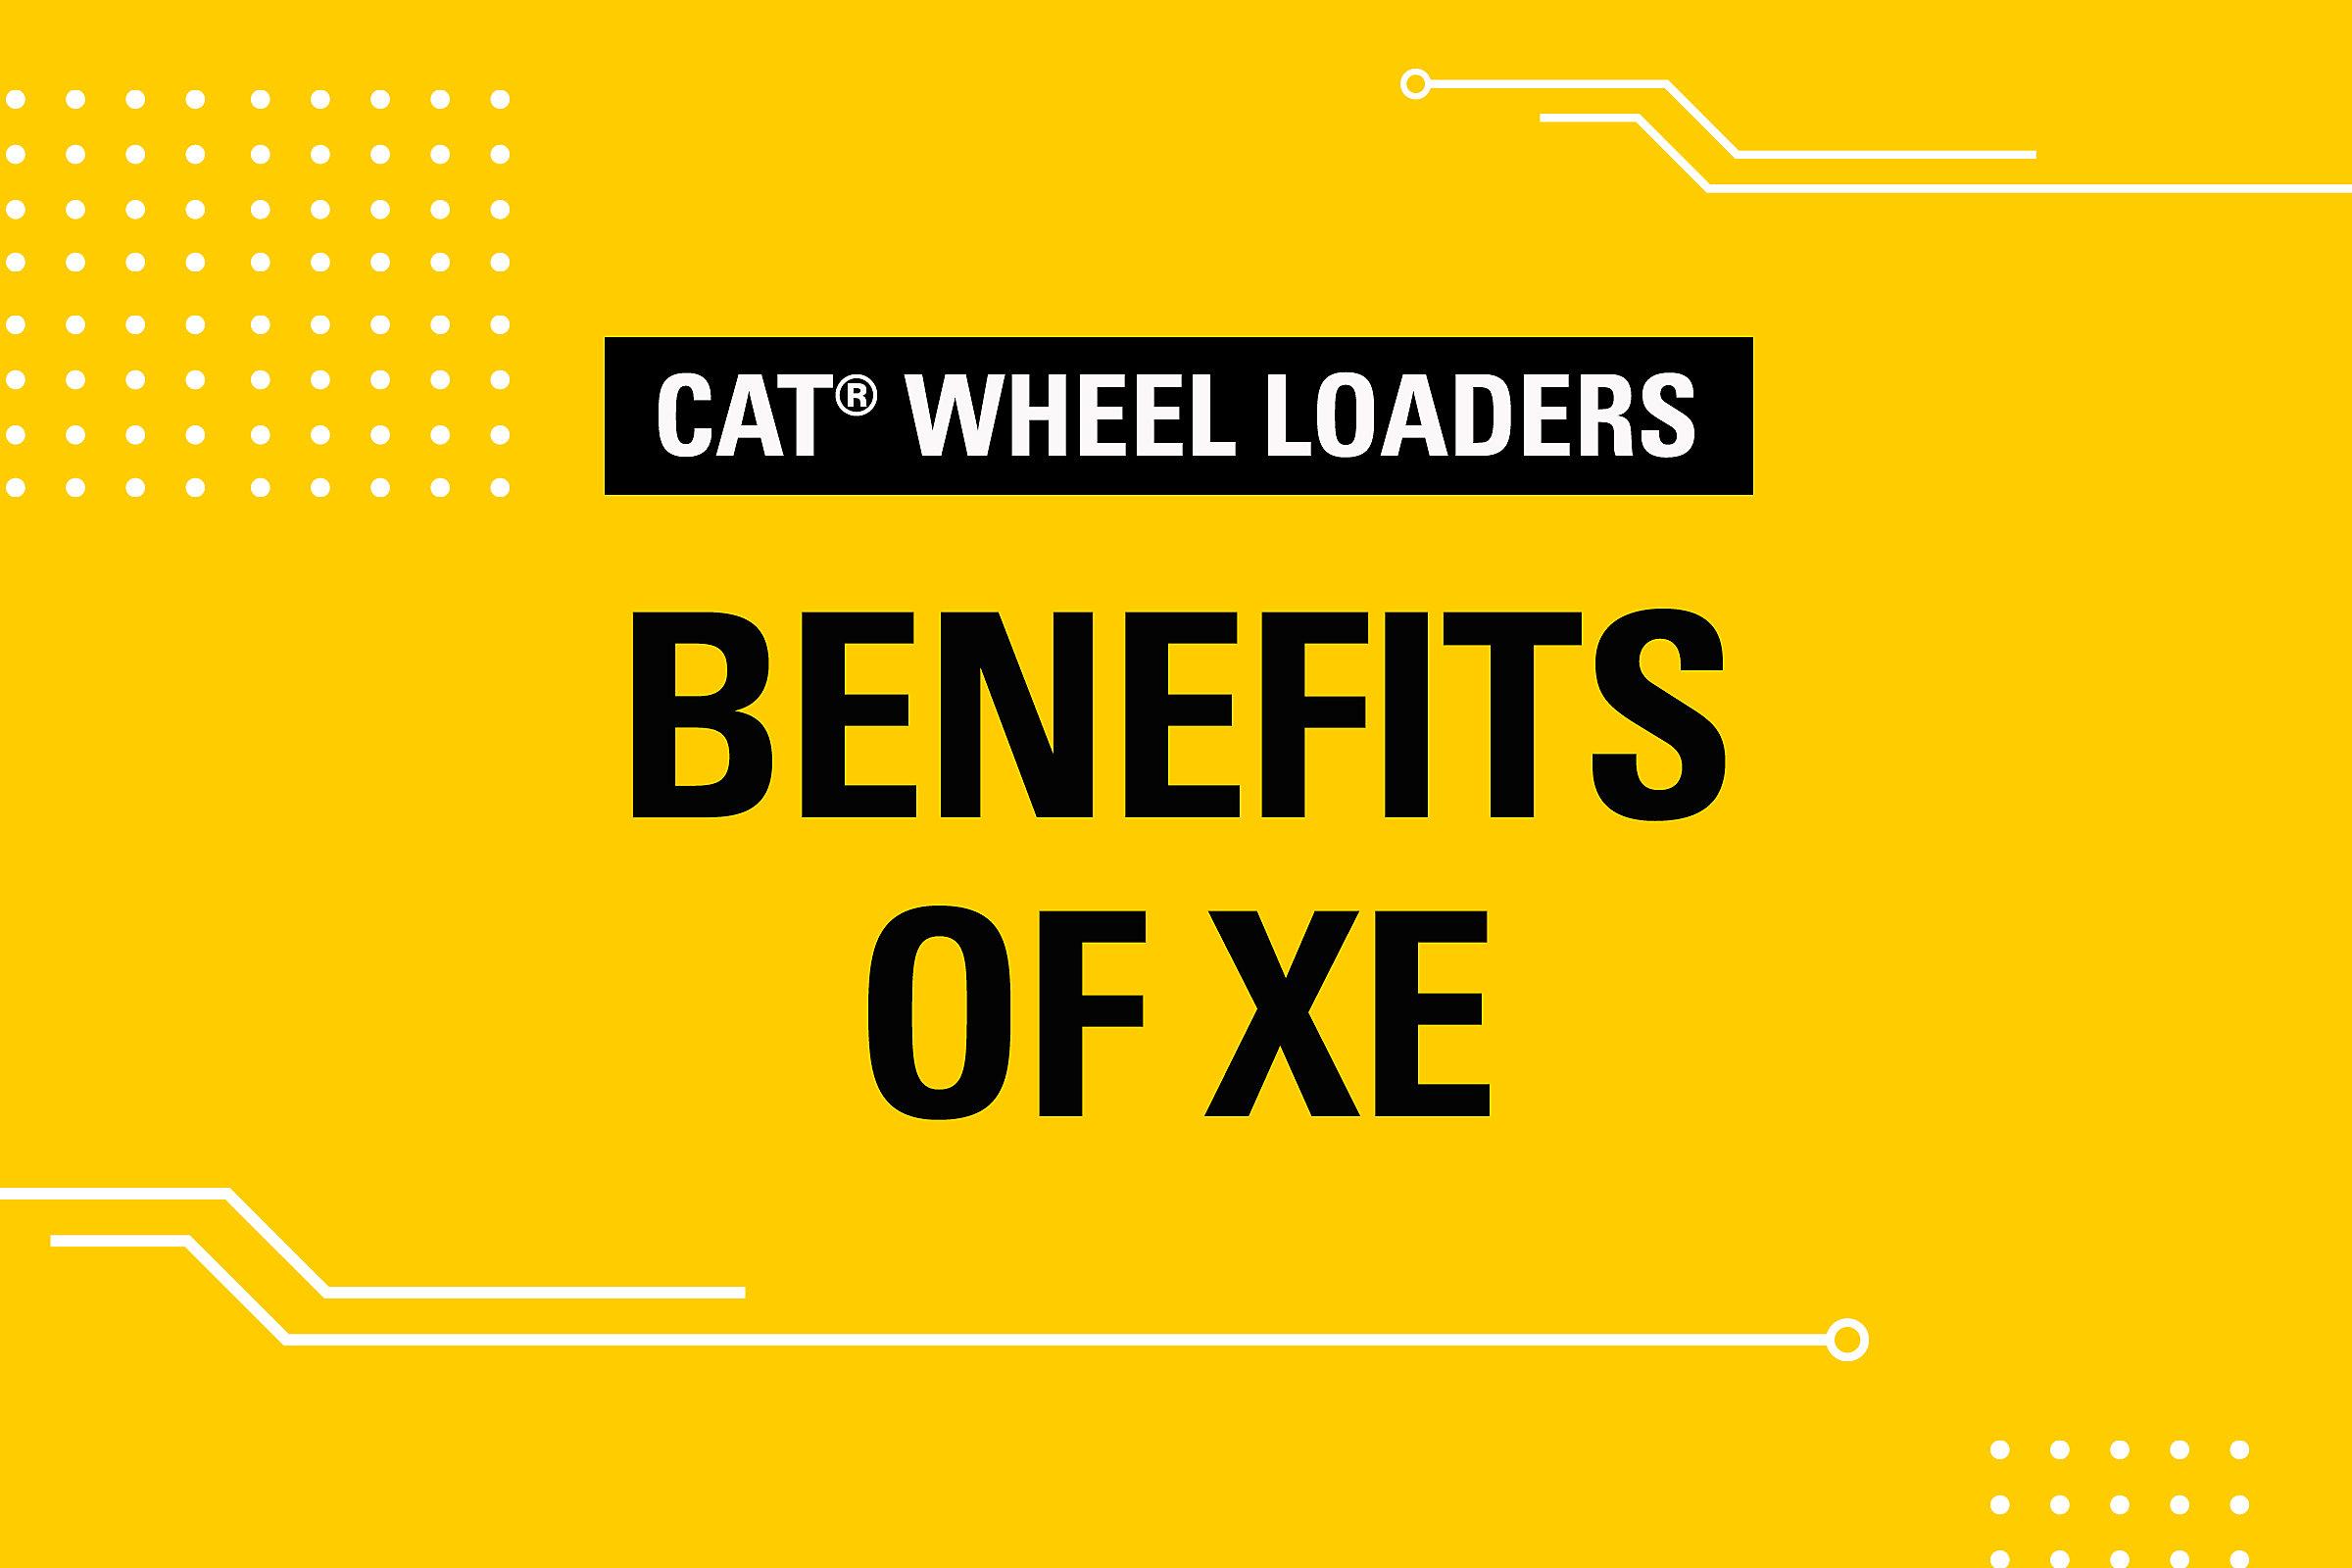 Wheel Loaders Benefit of XE